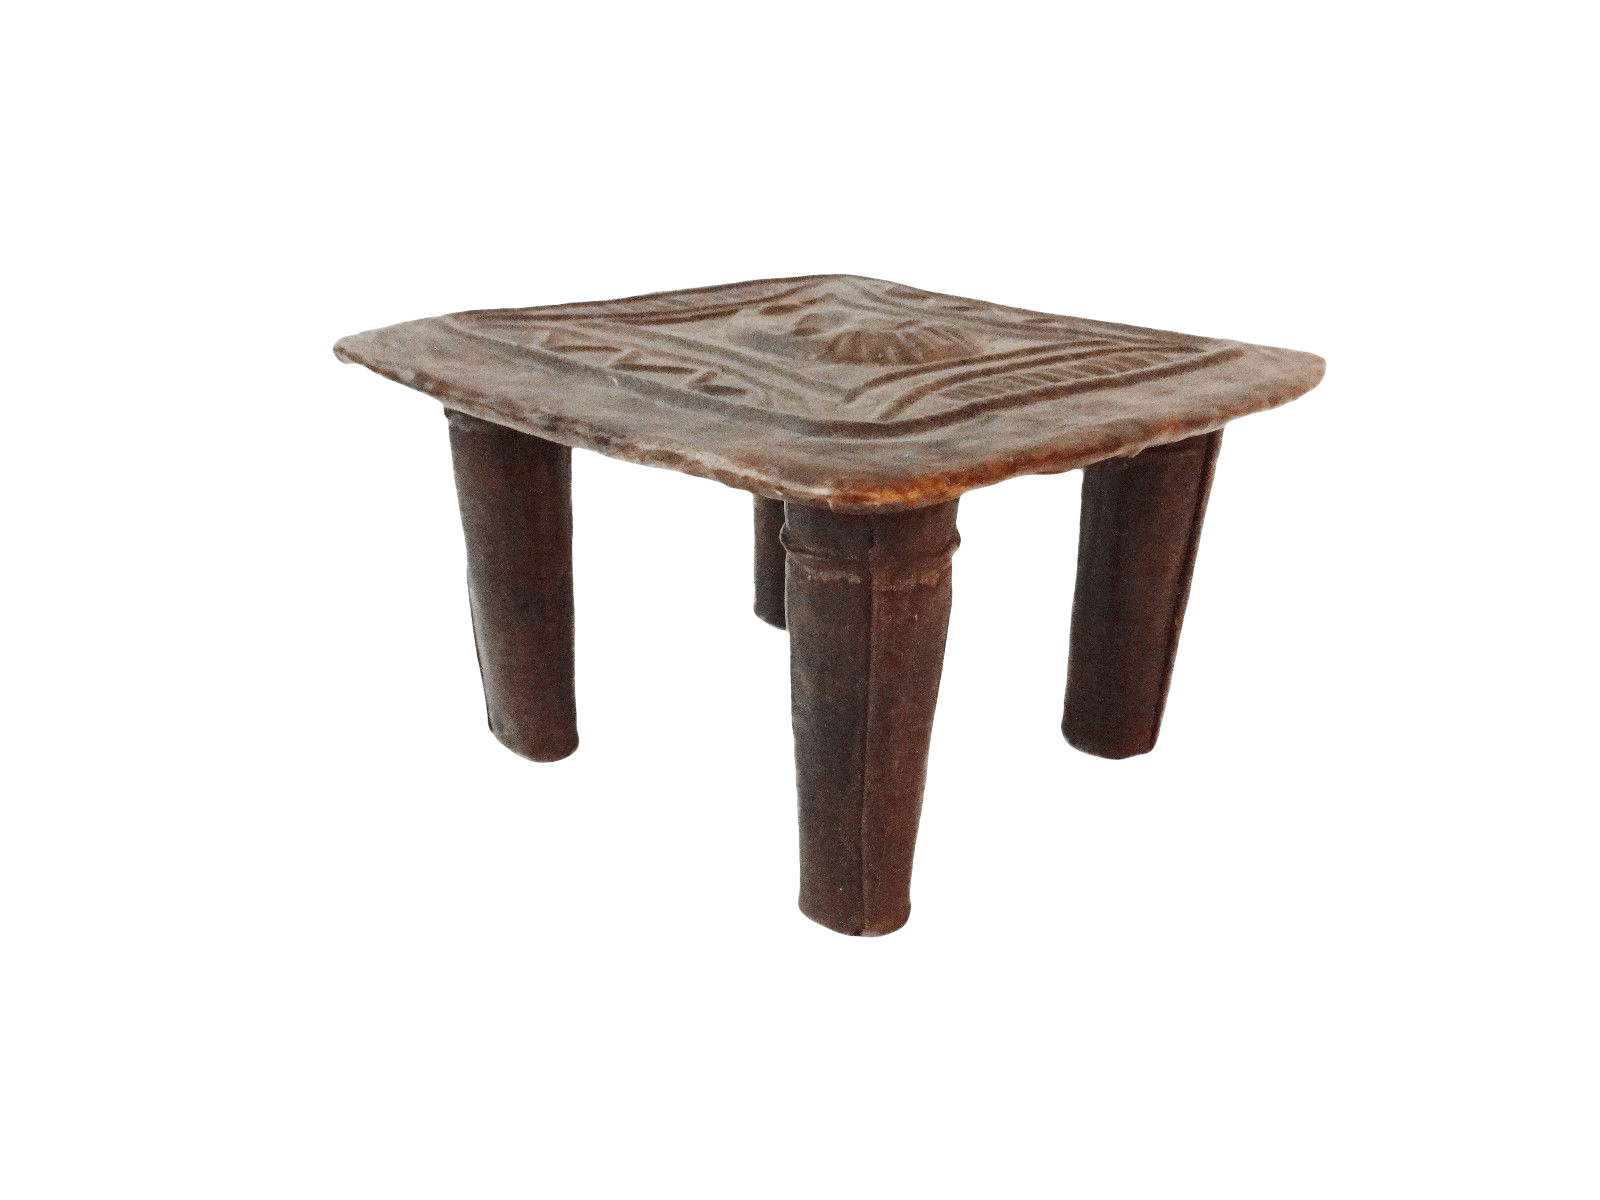 stool chair ghana tufted white old bronze brass ashanti tribe chairish